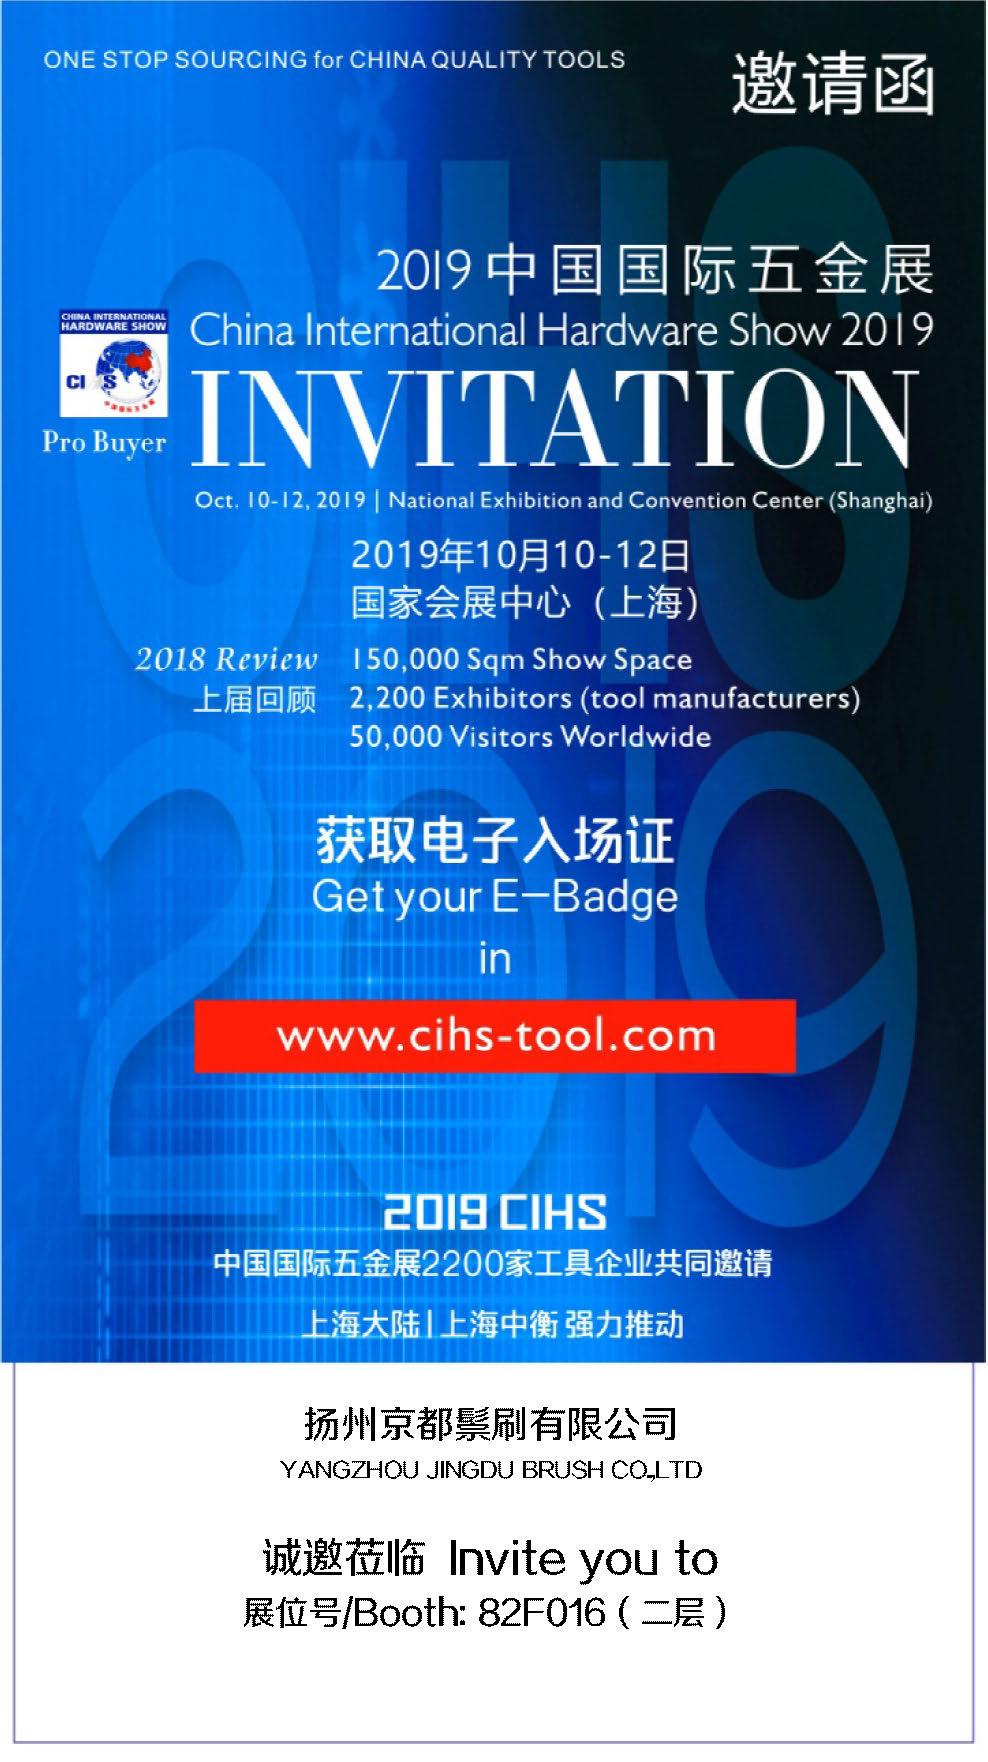 2019 China International Hardware Show Invitation